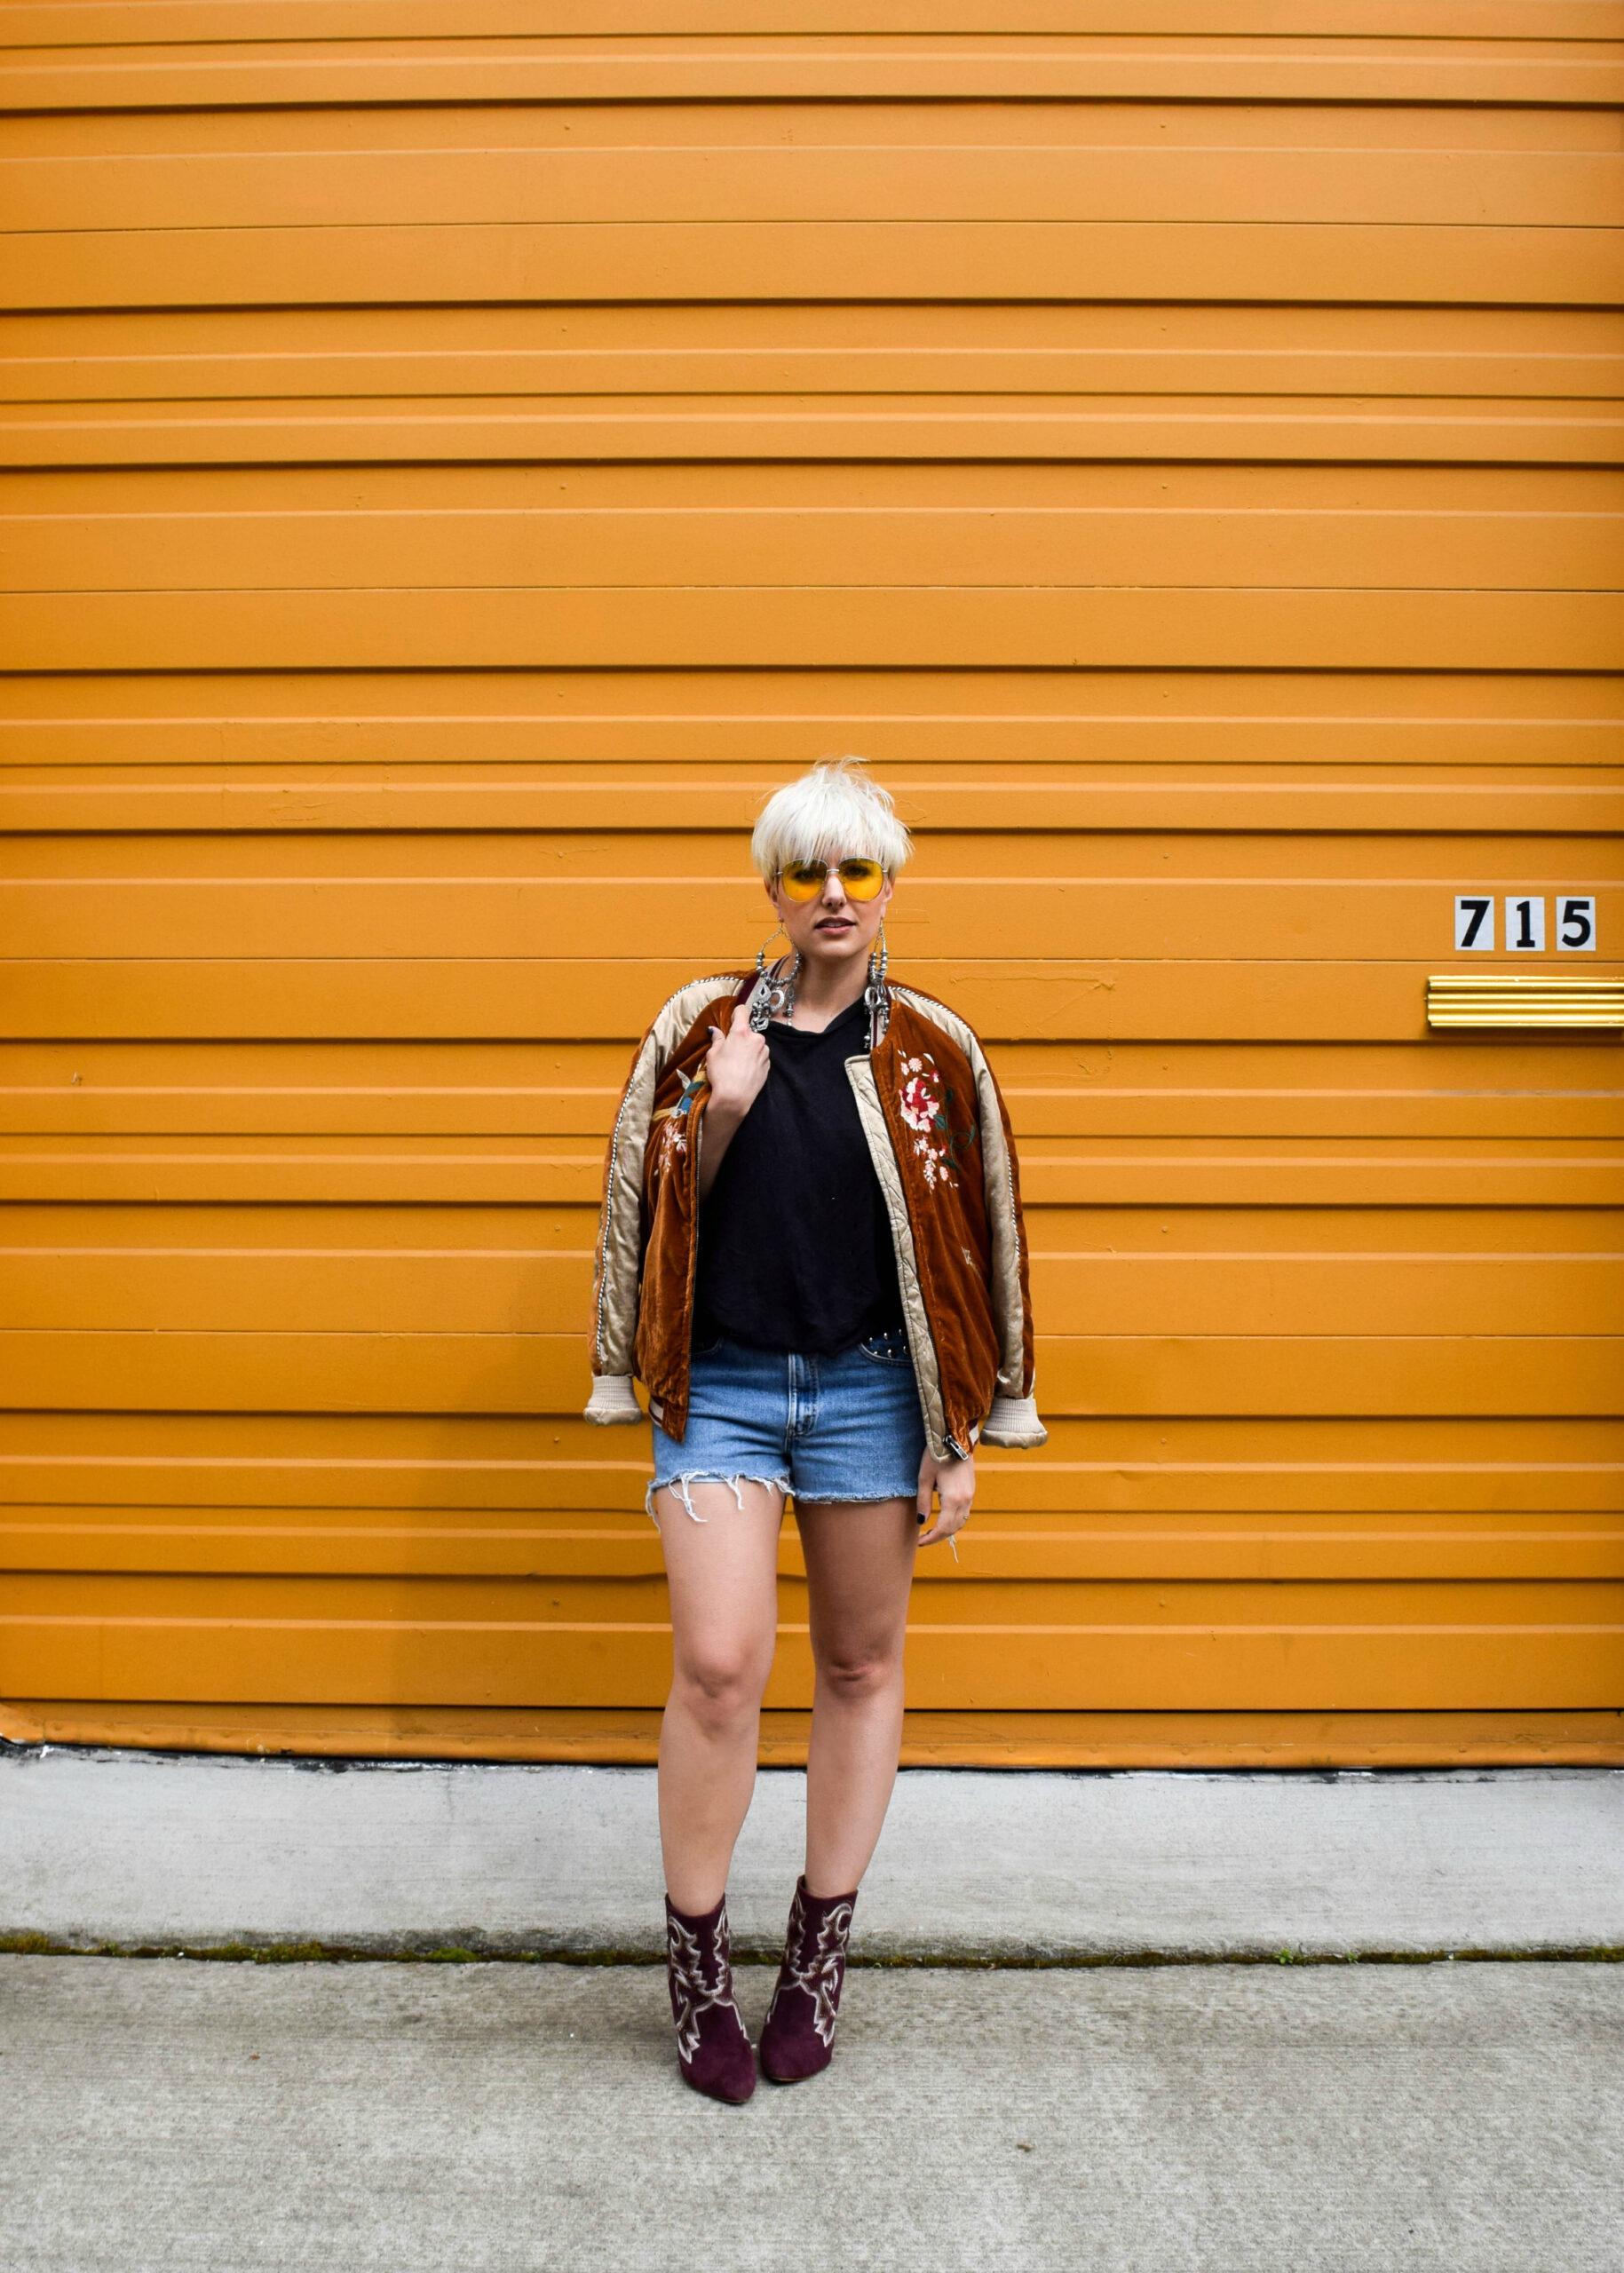 Festival Ready 3- 3 New Ways to Wear Your Bomber Jacket for 2017 - BloggerNotBillionaire.com